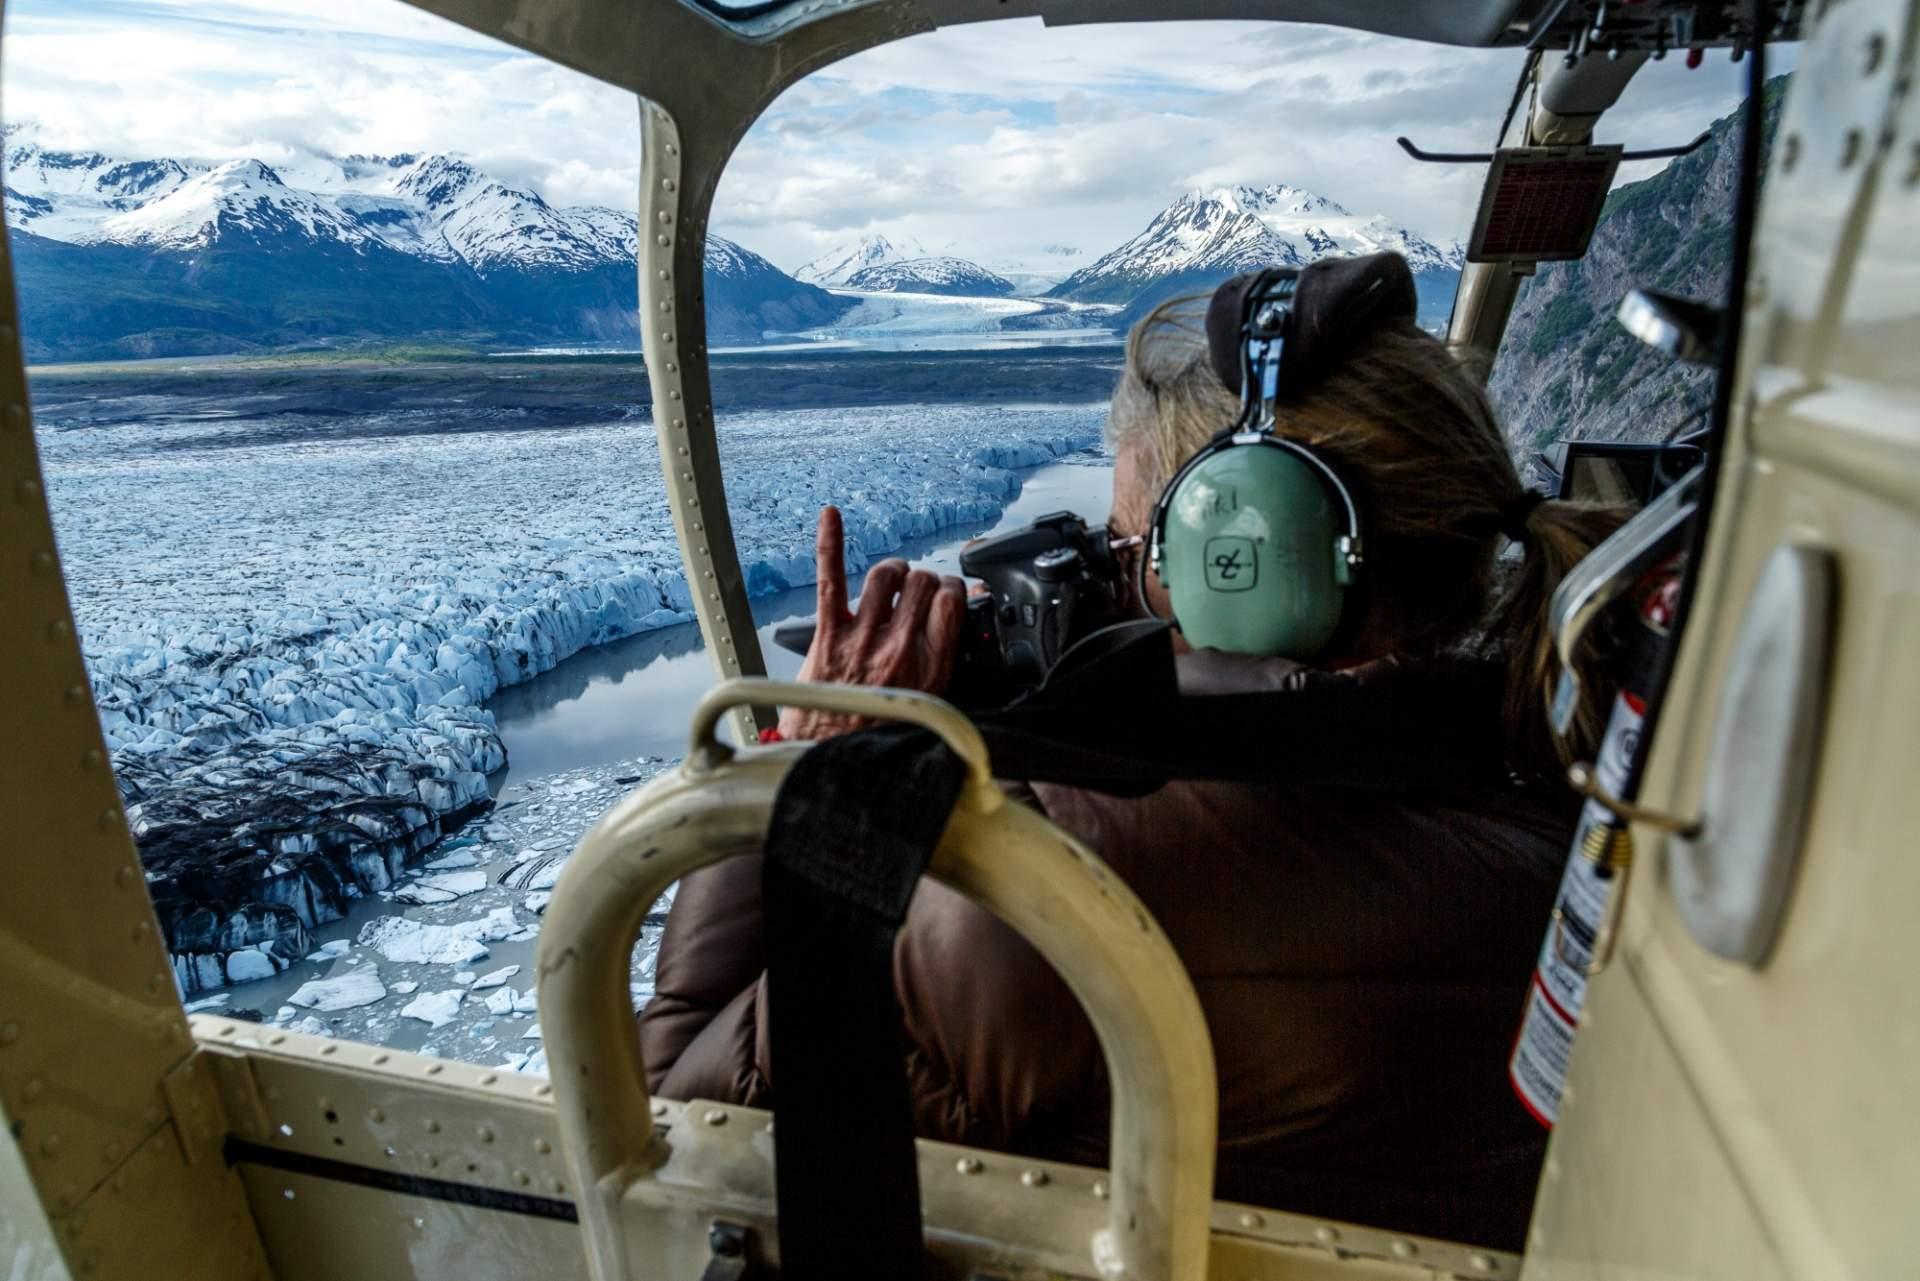 Jeff Schultz Colony Glacier Flyout 160604 5 M9398